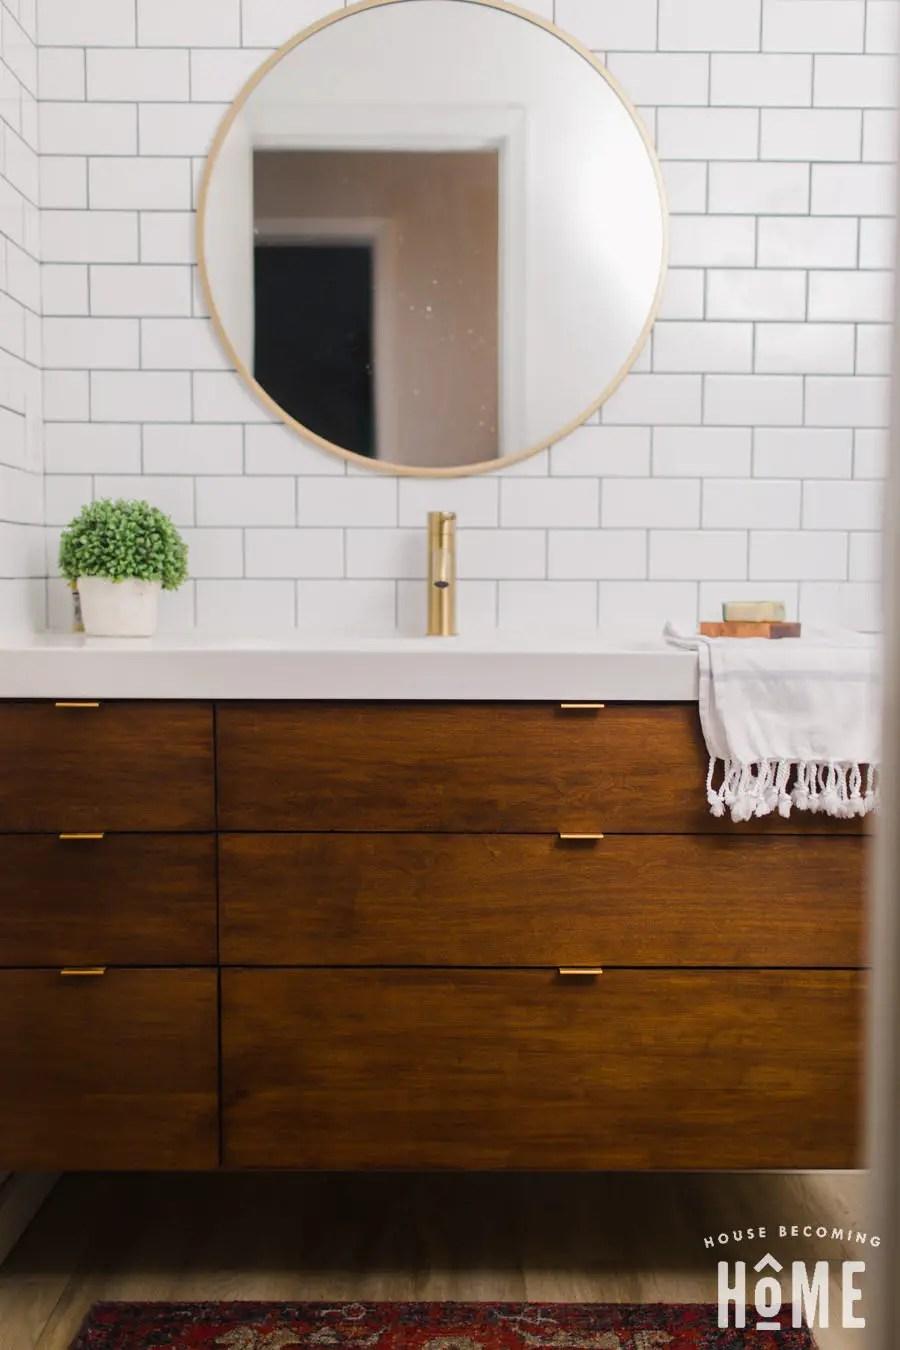 How to Build a DIY Vanity Ikea Odensvik Sink